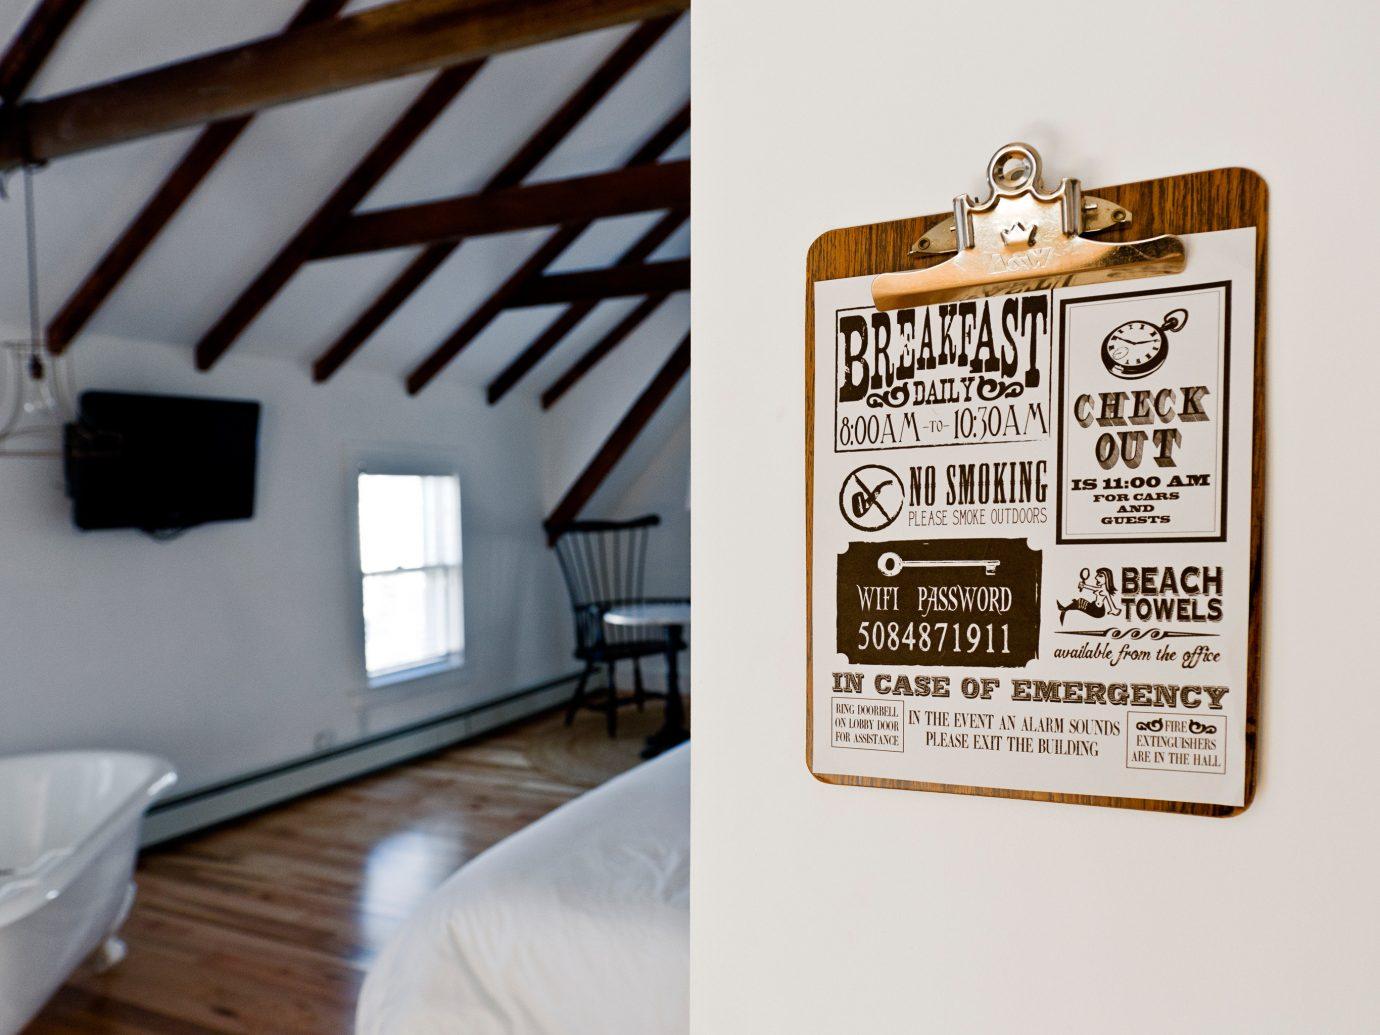 Adult-only B&B Bath Boutique Hip Lodge indoor lighting brand Design